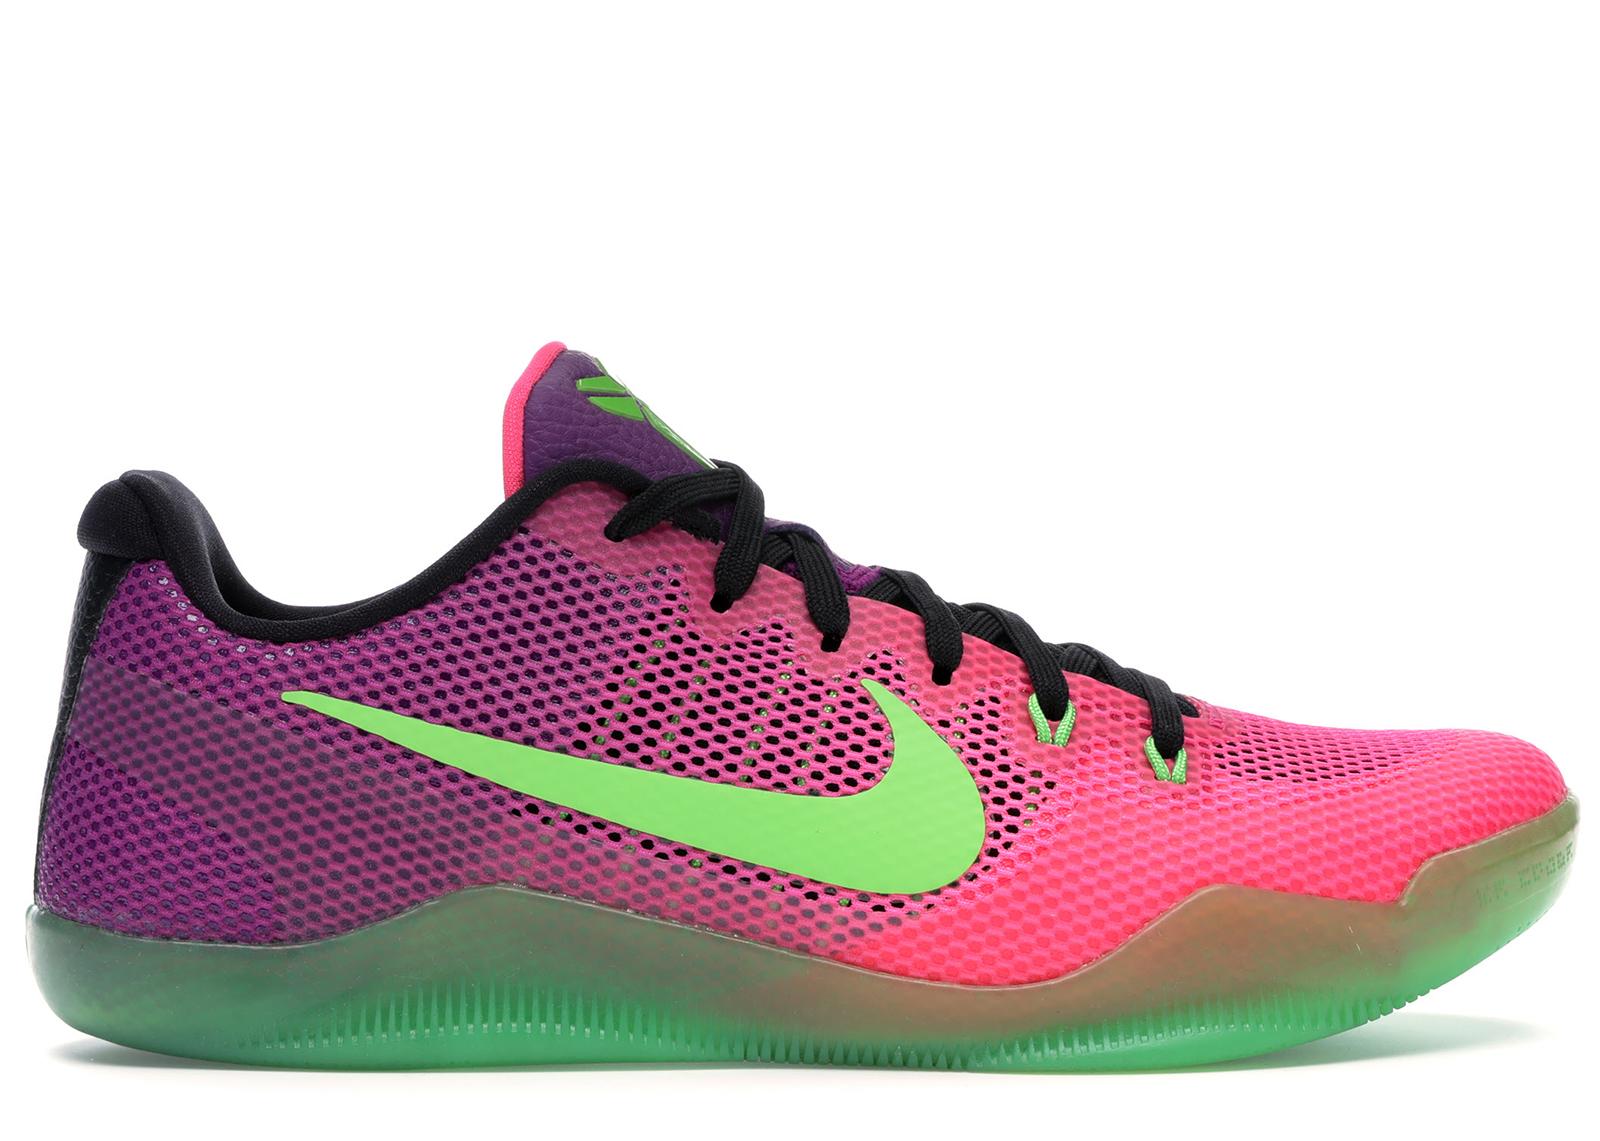 Nike Kobe 11 EM Low Mambacurial